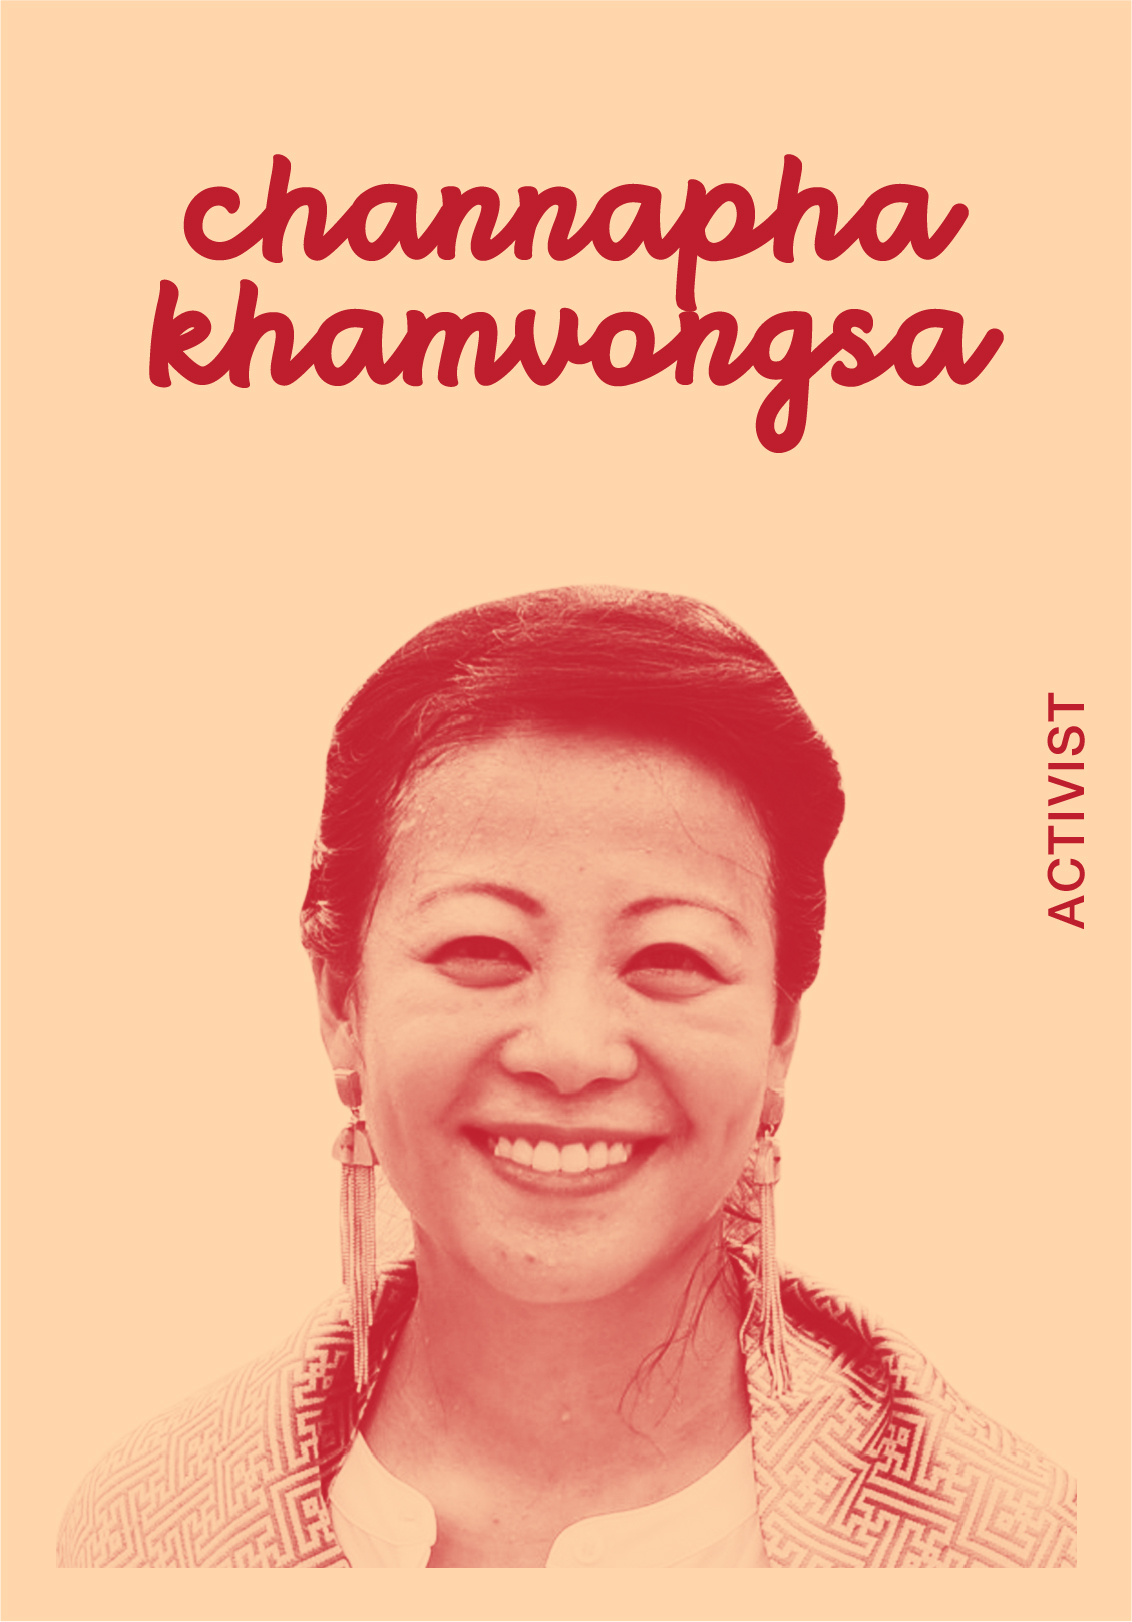 Channapha Khamvongsa    @CHANNAPHASAYS